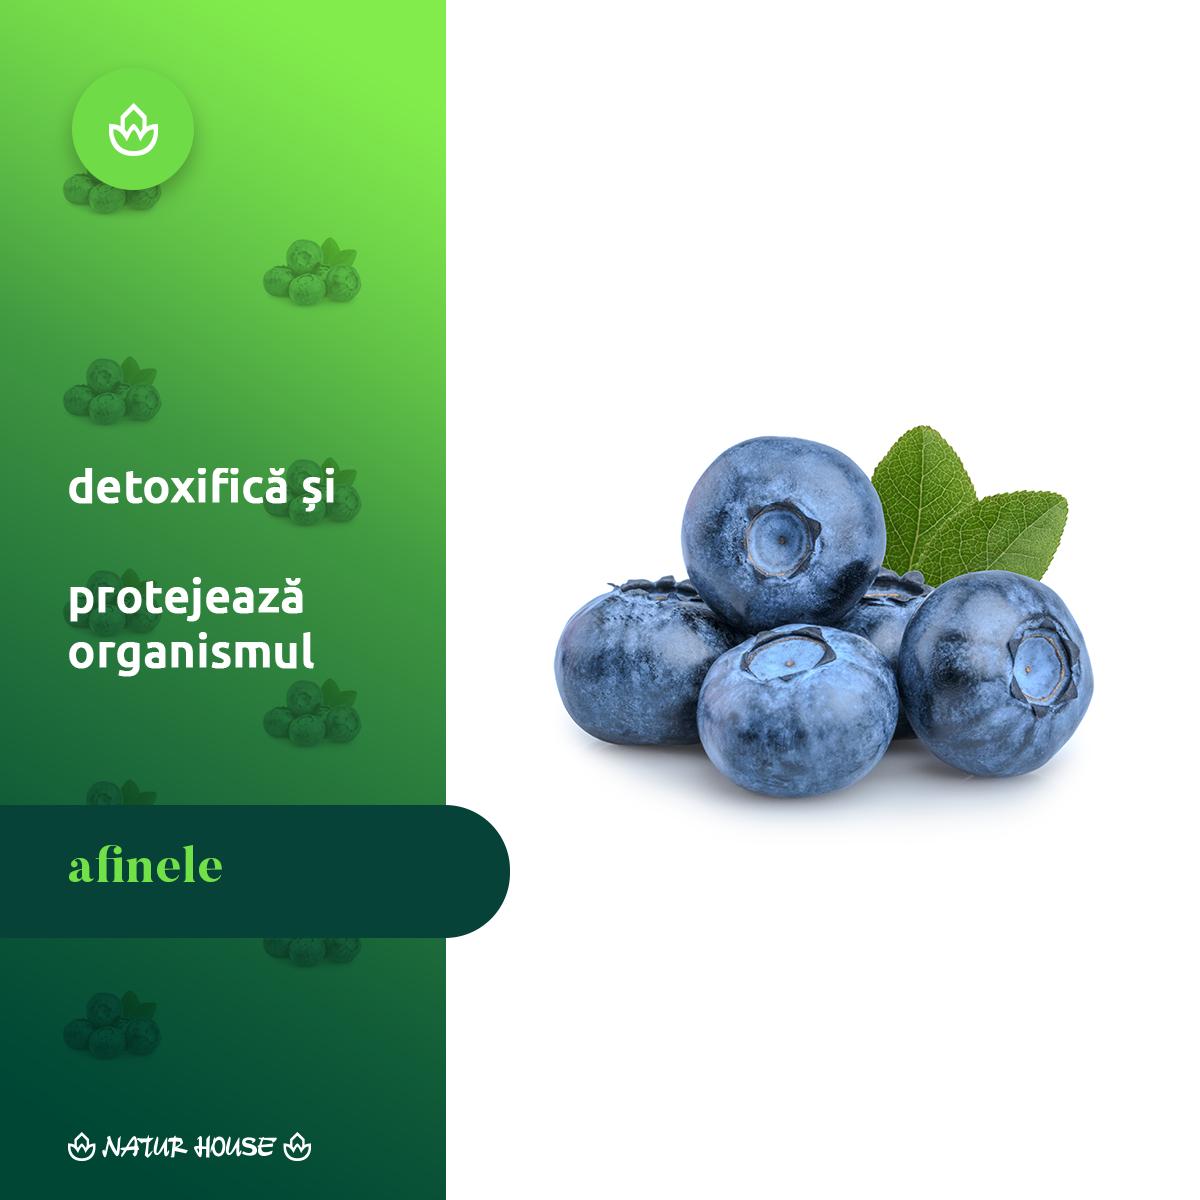 varicoză și afine)